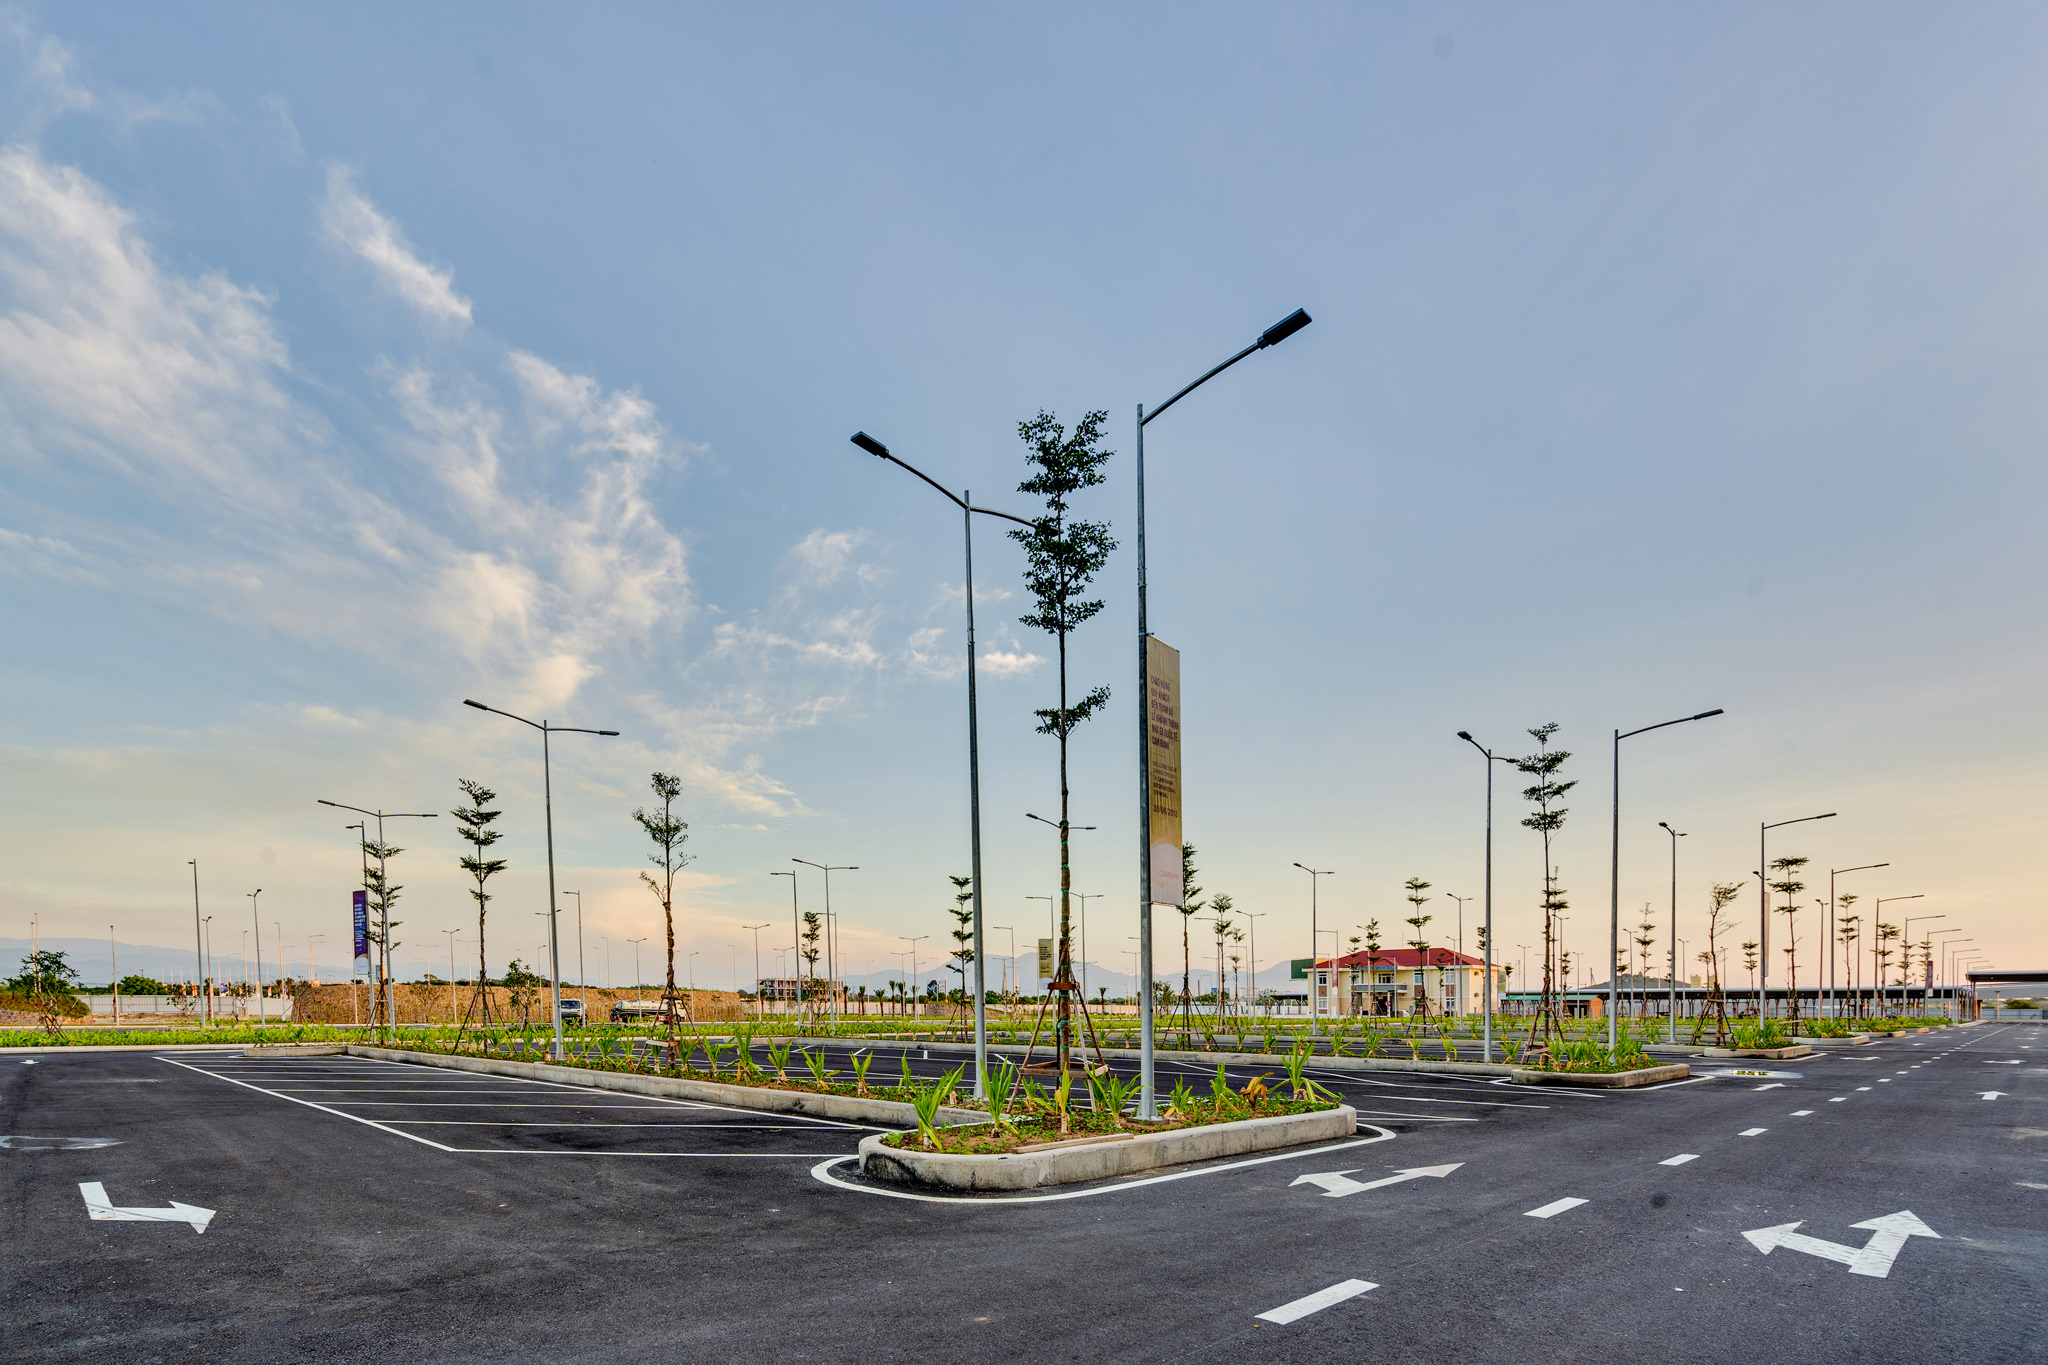 20180626 - Cam Ranh Airport - Architecture - 0025.jpg